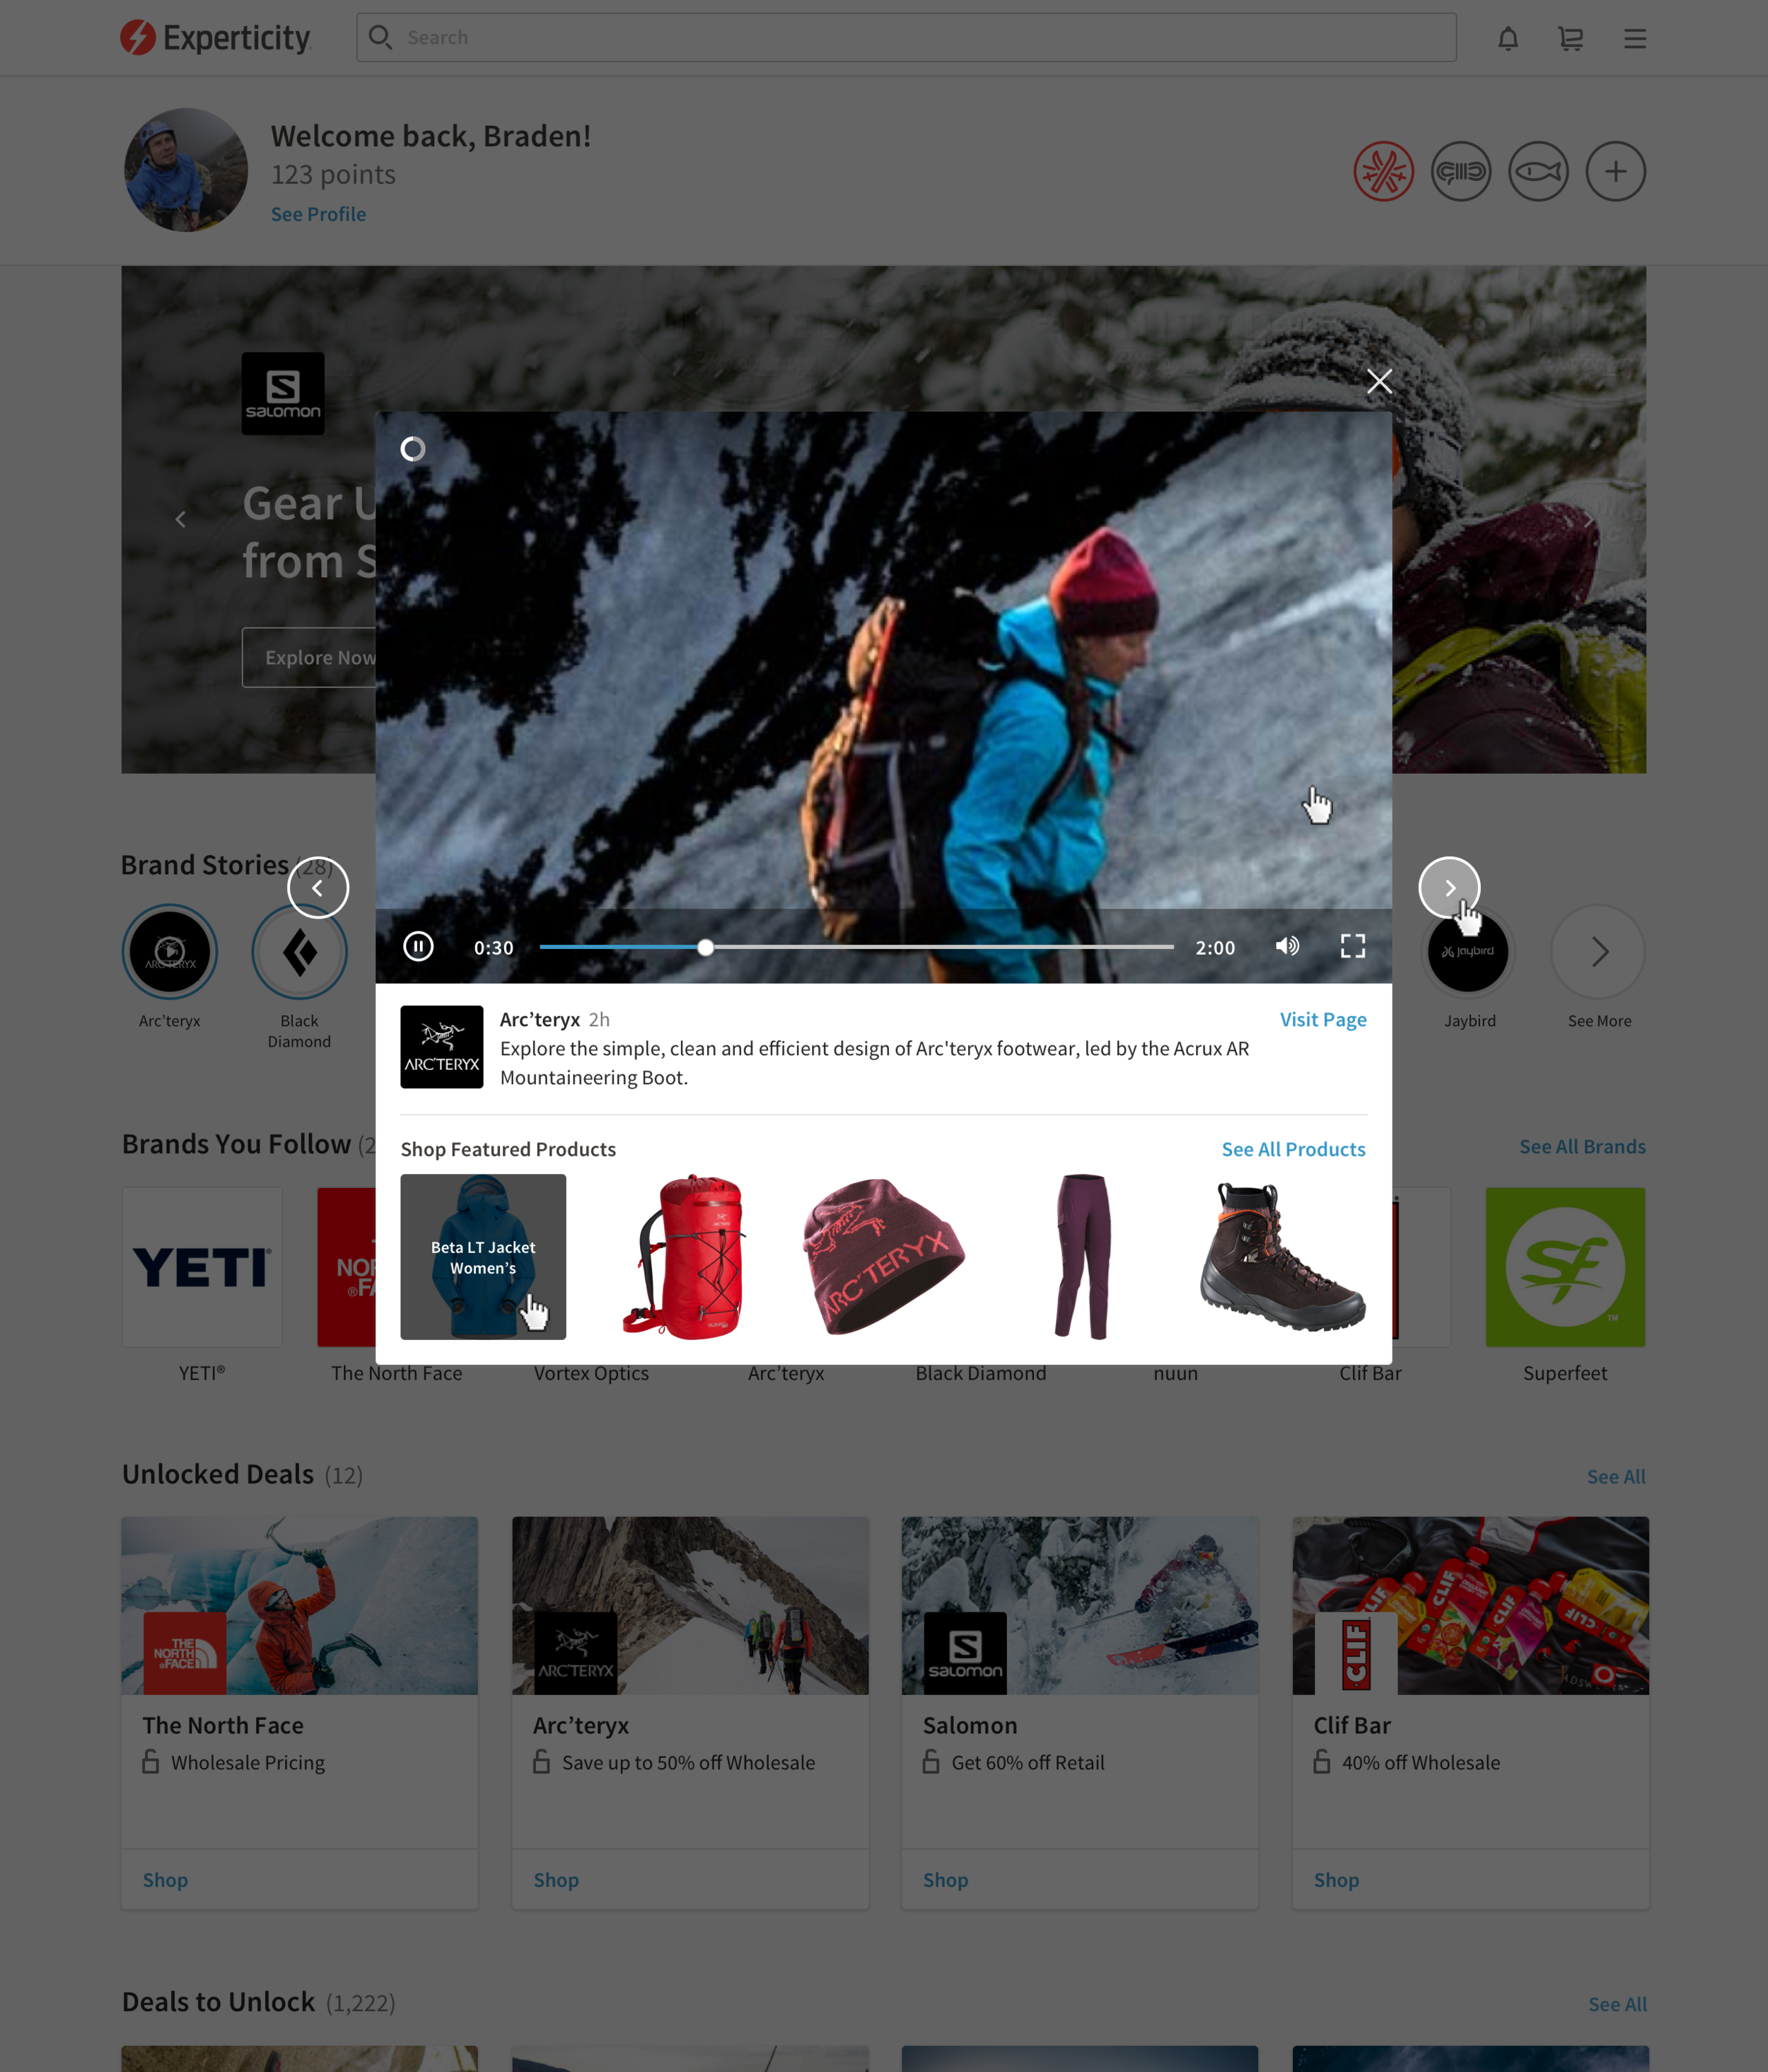 Brand Stories Video Player